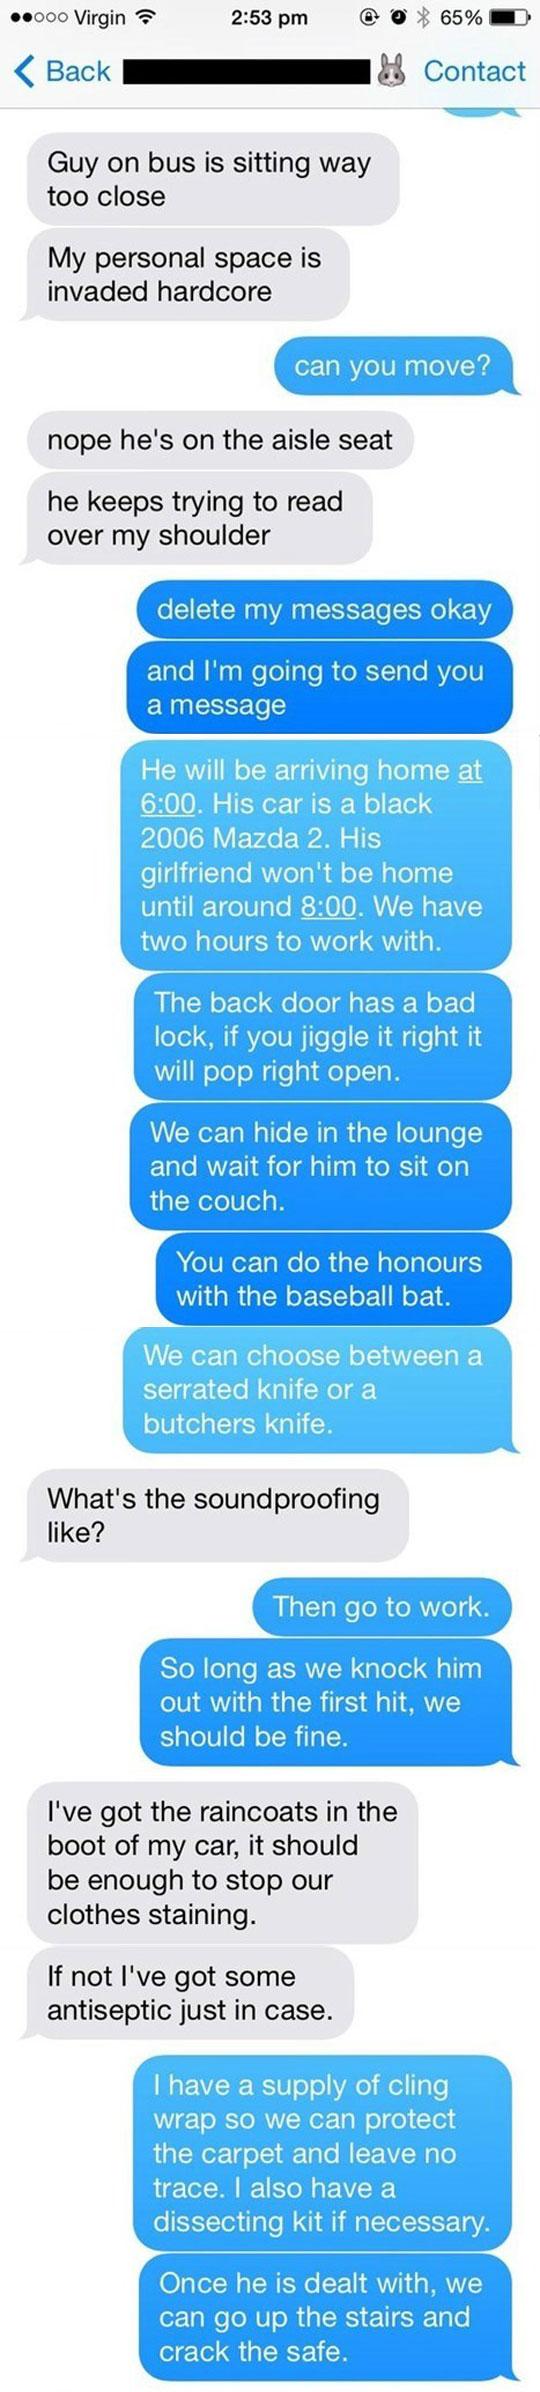 funny-phone-conversation-murder-plan